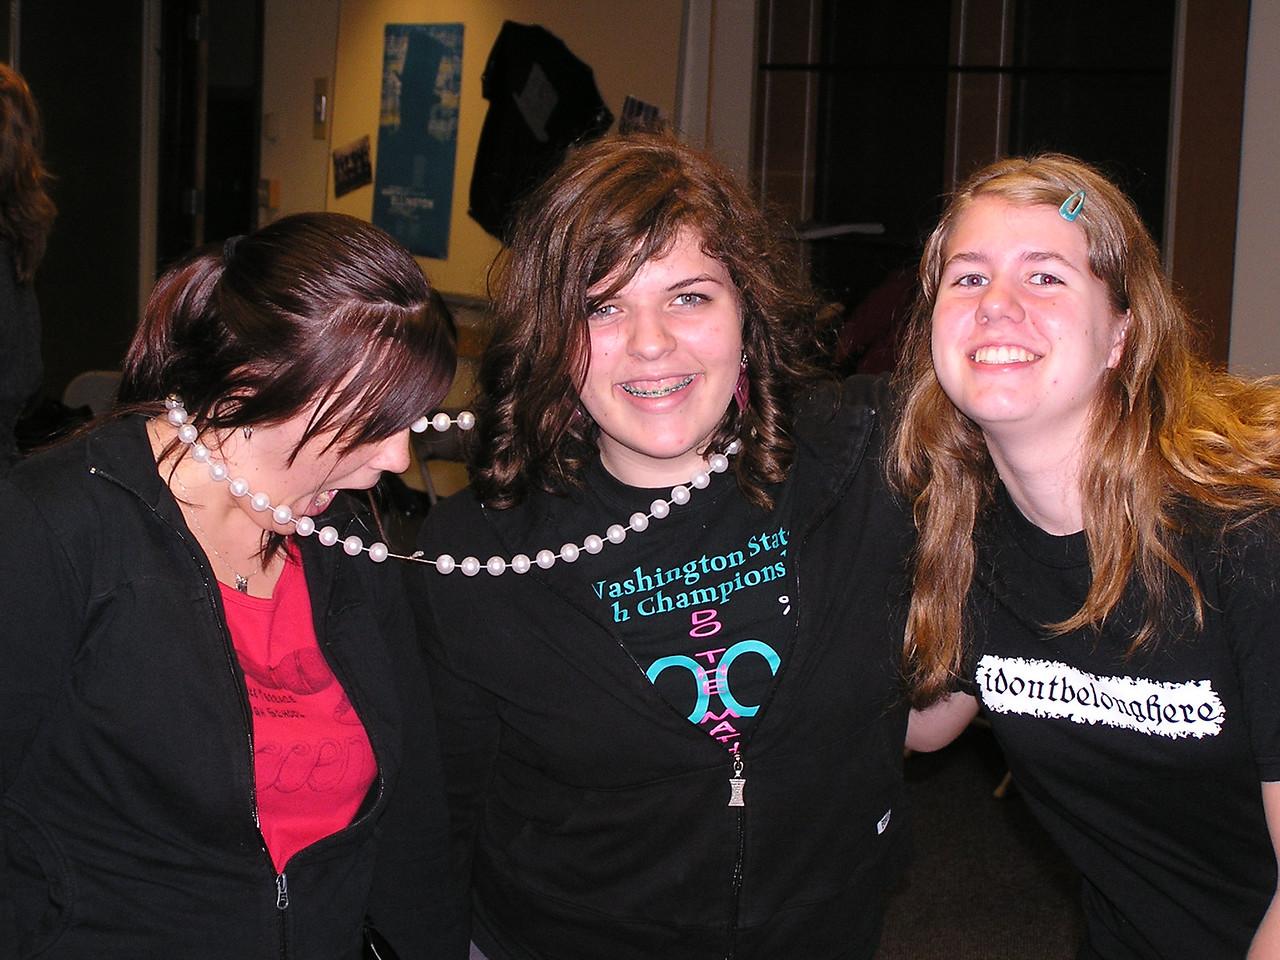 Kevin's friends from band.  (L to R)  Morgan, Marina, Shauna.